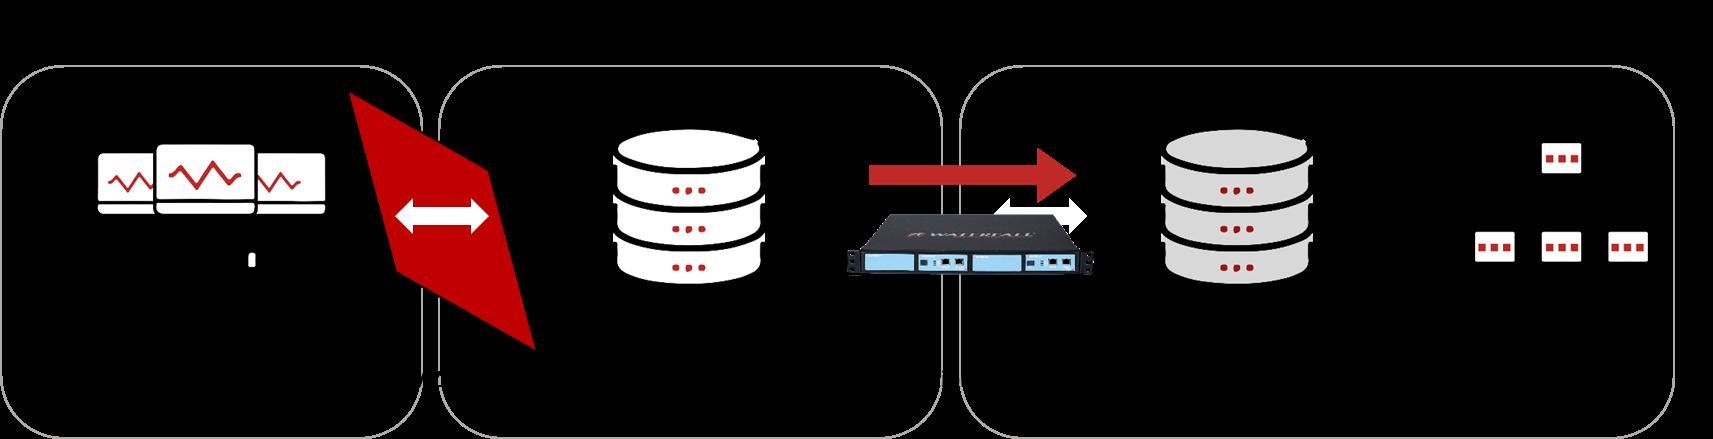 Figure 2: Modern IT/OT DMZ Scenario 2